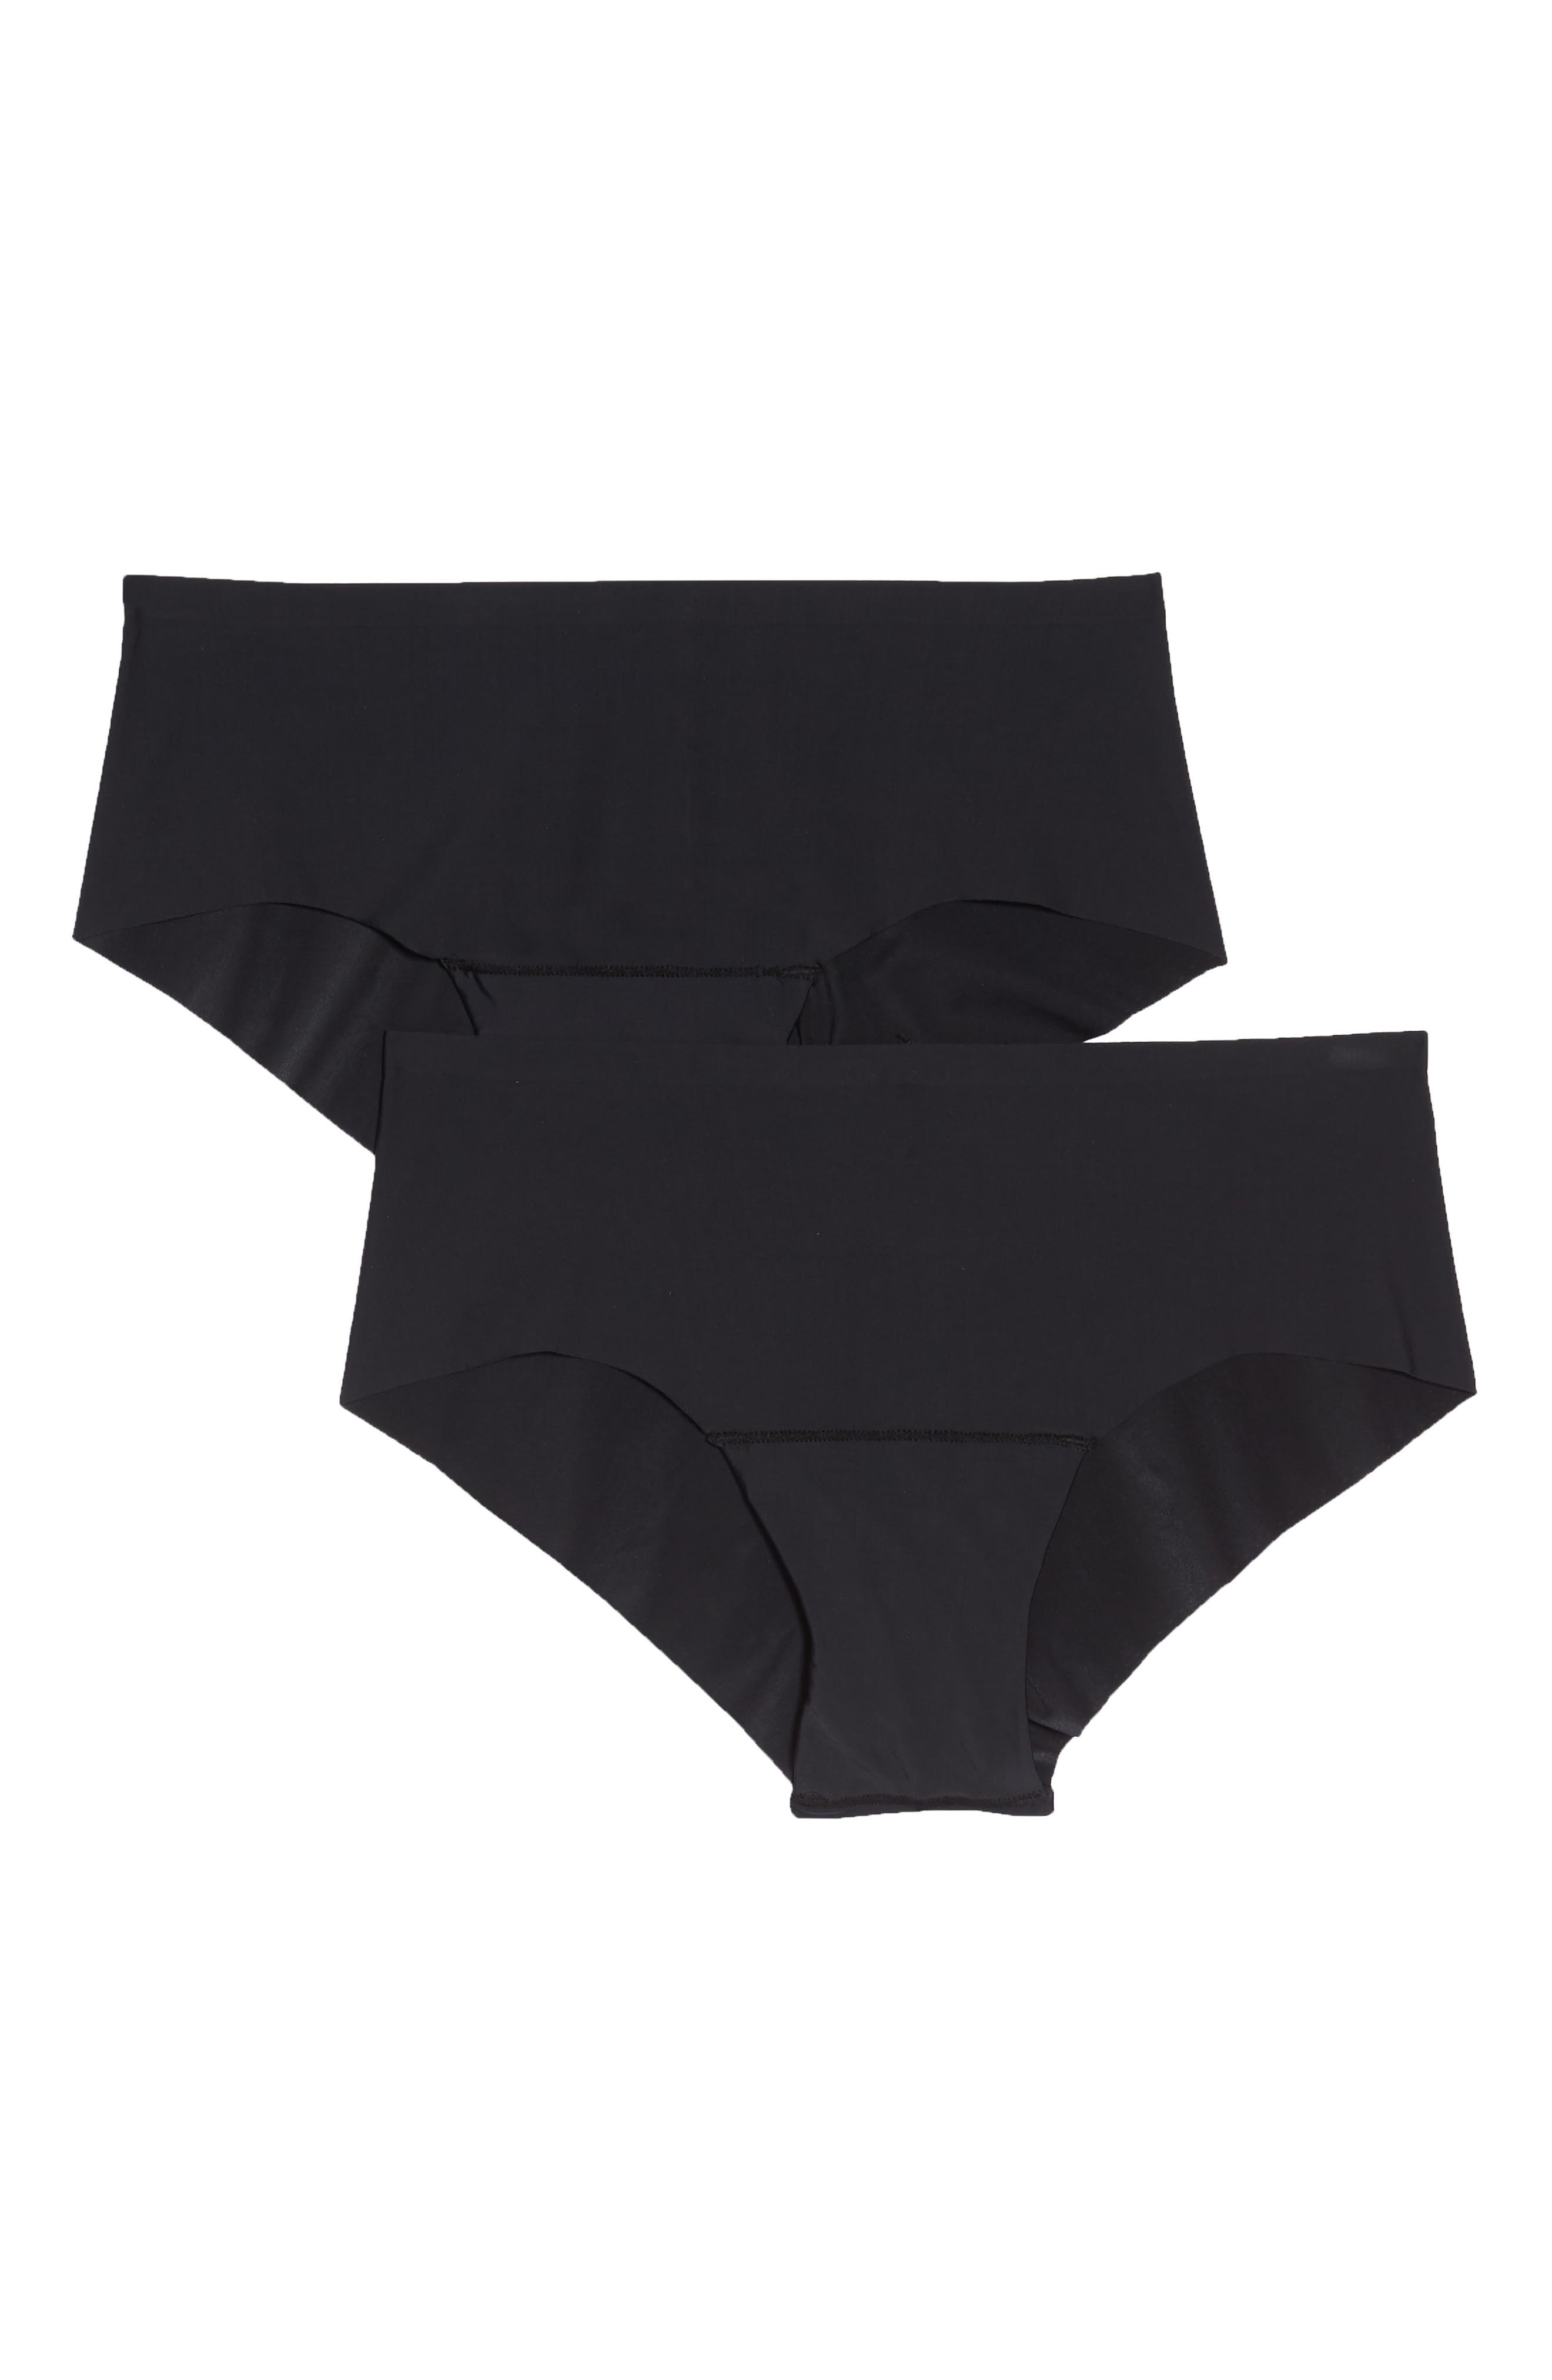 2-Pack Dream Invisibles Hipster Panties,                             Main thumbnail 1, color,                             Black